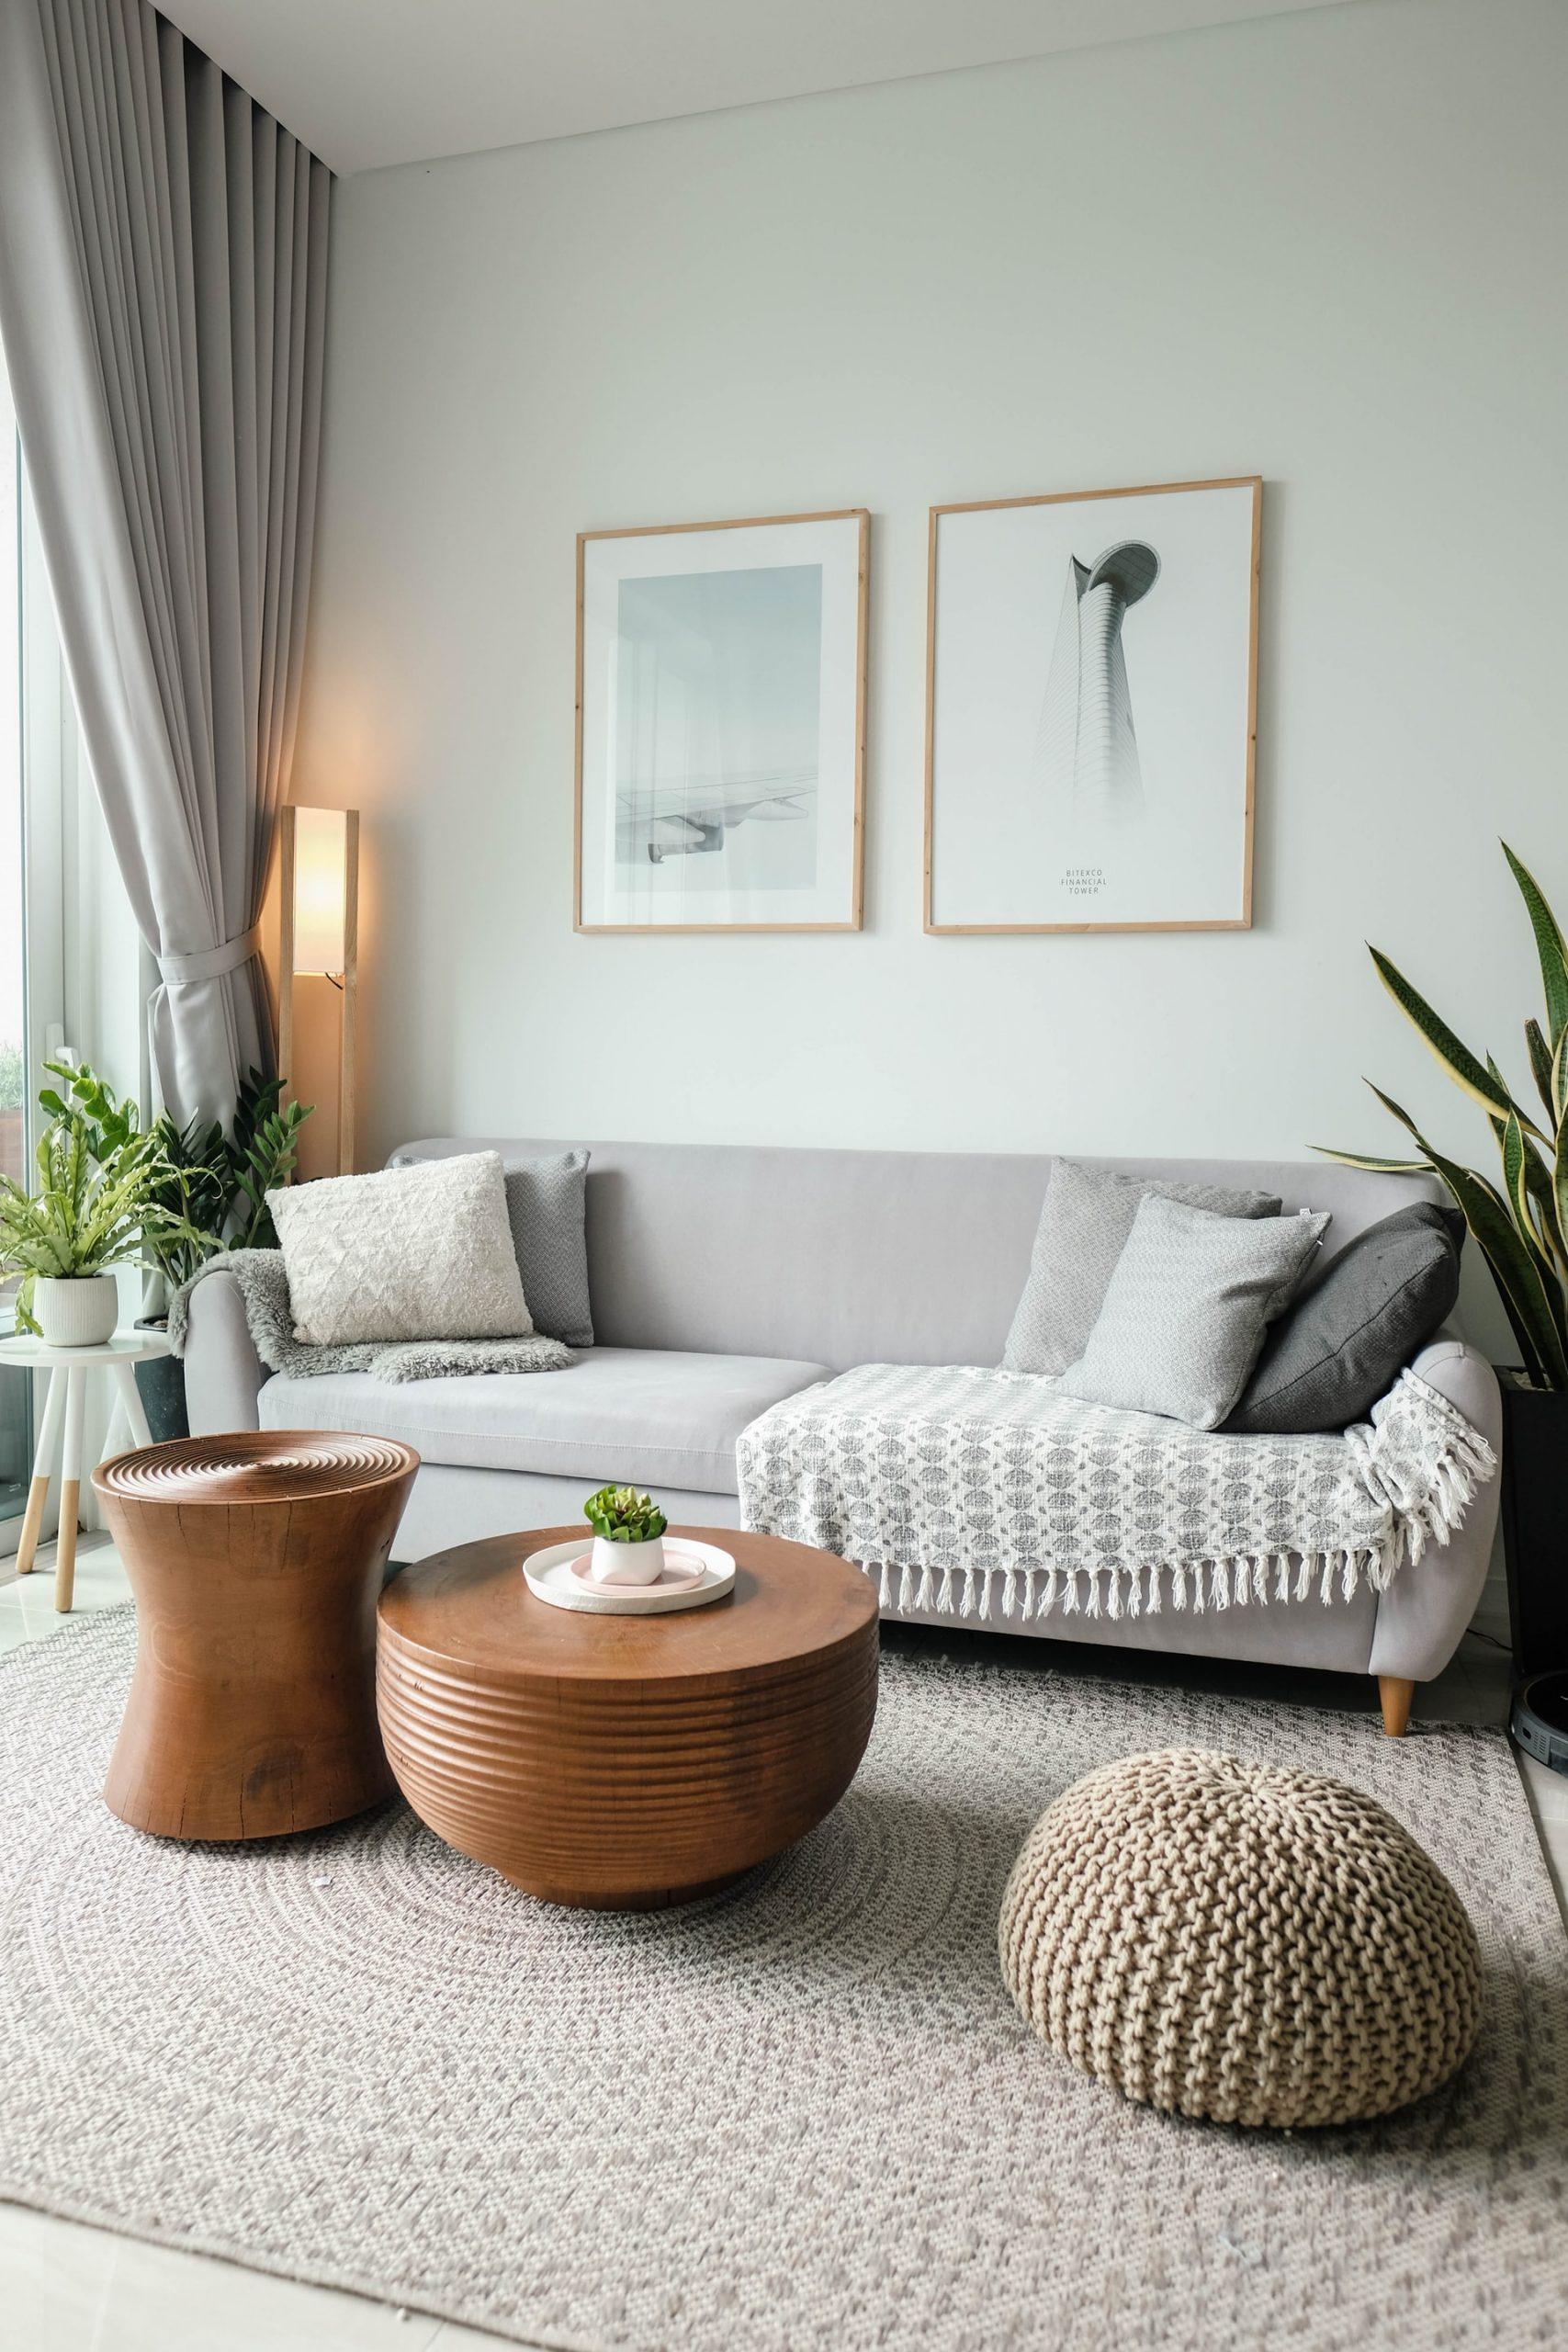 Bright, minimalist and cosy living room decor